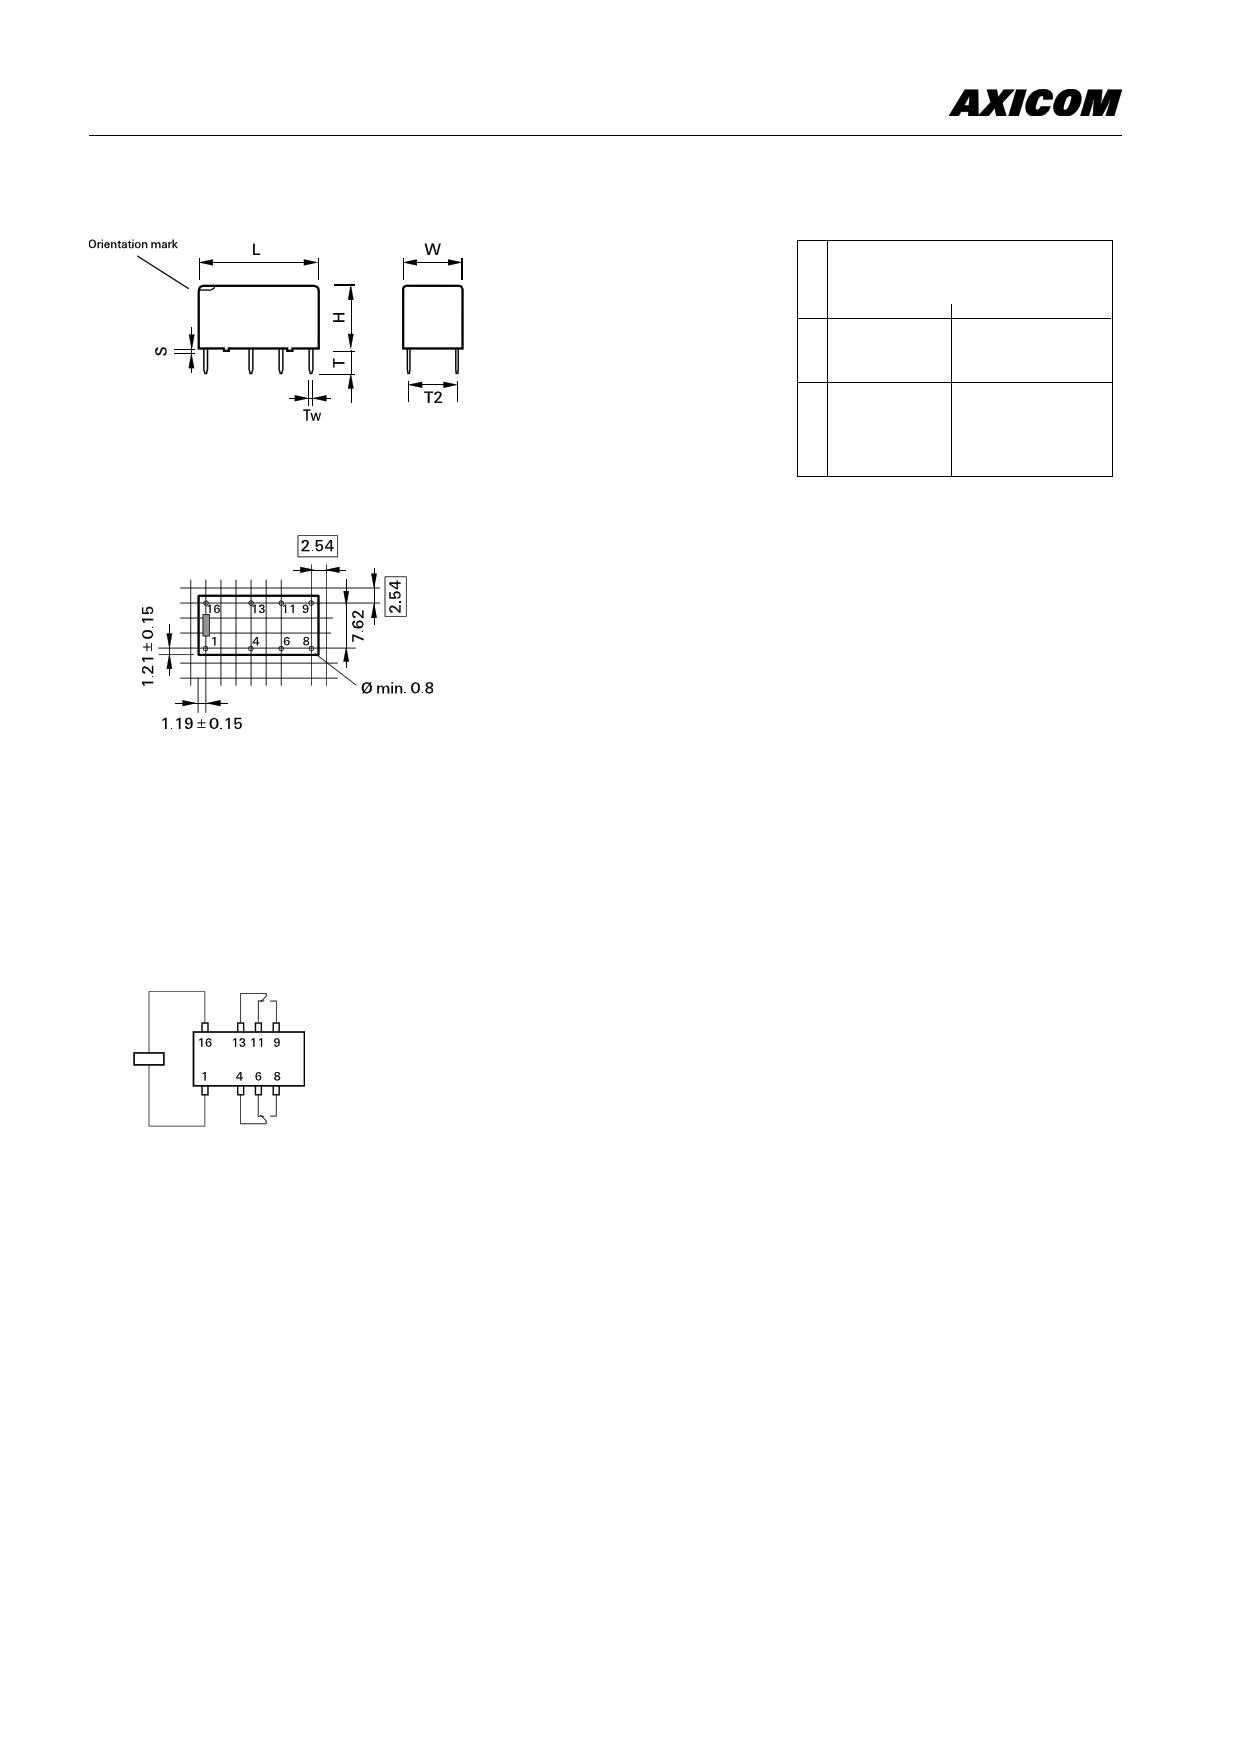 2-1462000-6 Даташит, Описание, Даташиты